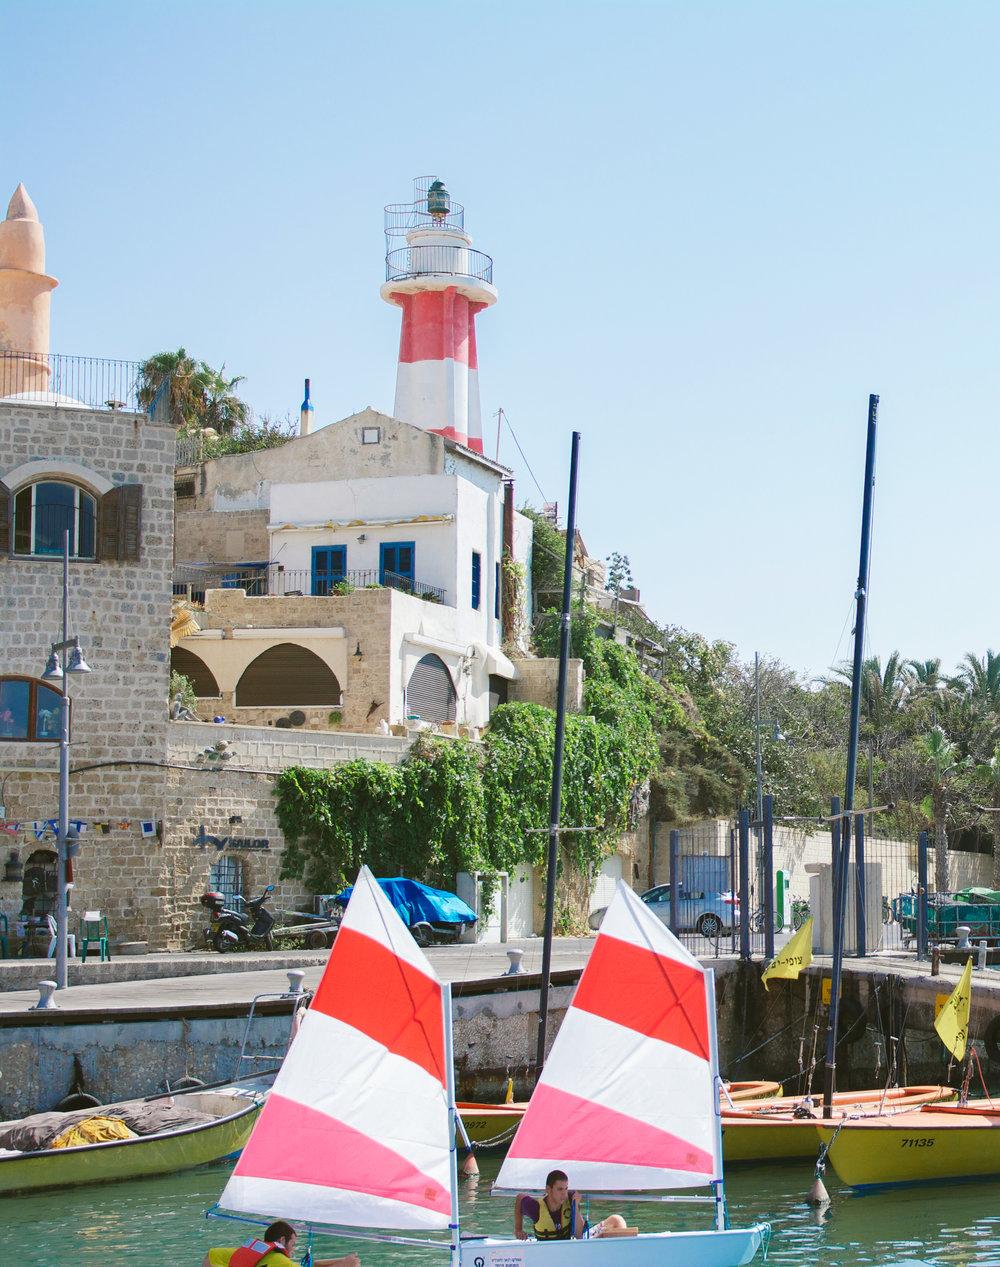 18-TEL AVIV - VIA TOLILA.jpg